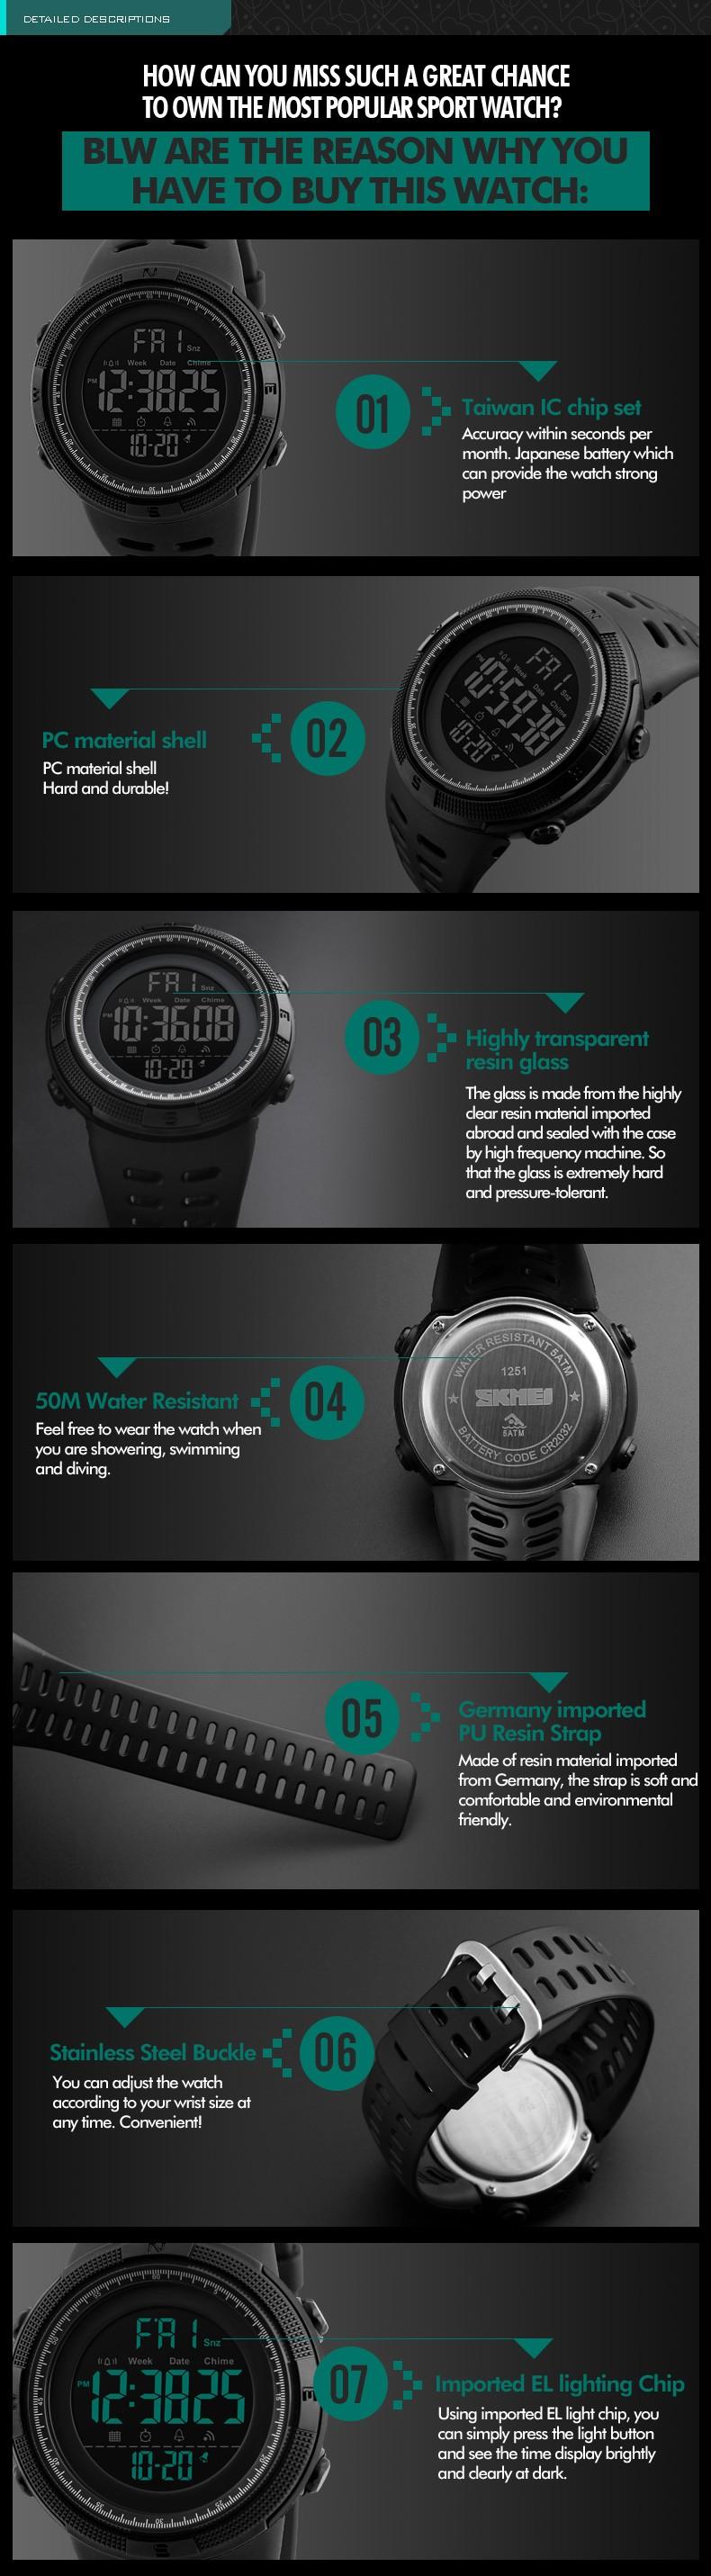 Chinese Supplier Men Luxury Sport Wristwatch Skmei 1251 LED Digital Countdown Double Time Watch Fashion Alarm Watches Men